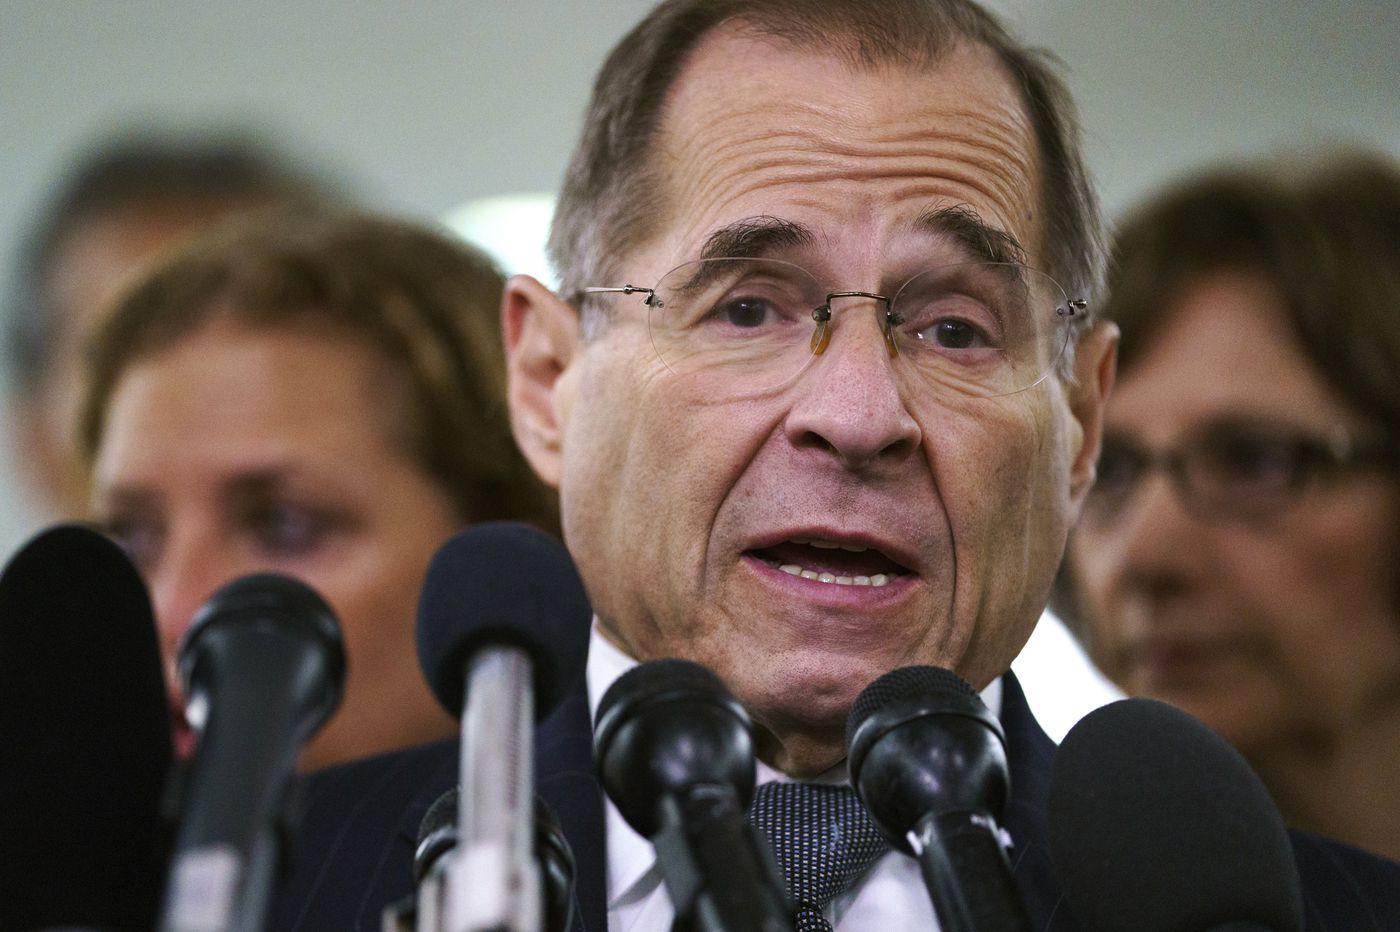 Top House Dems raise prospect of impeachment, jail for Trump